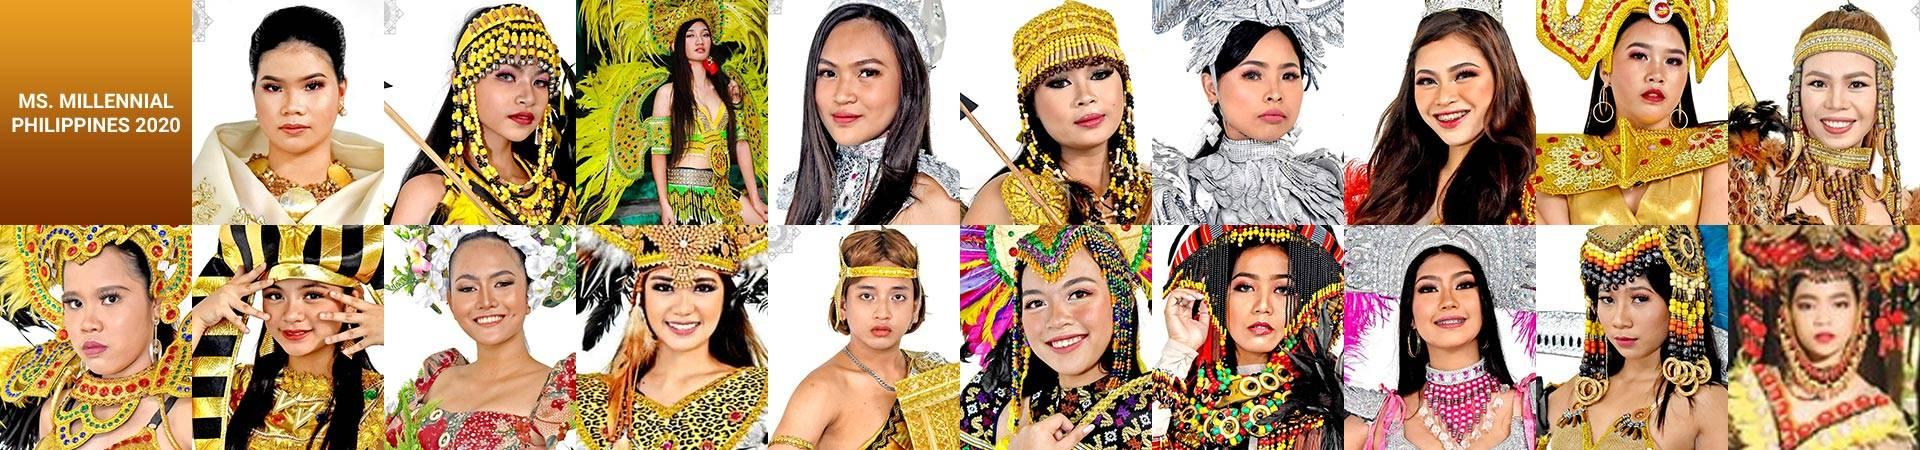 MS. MILLENNIAL PHILIPPINES 2020